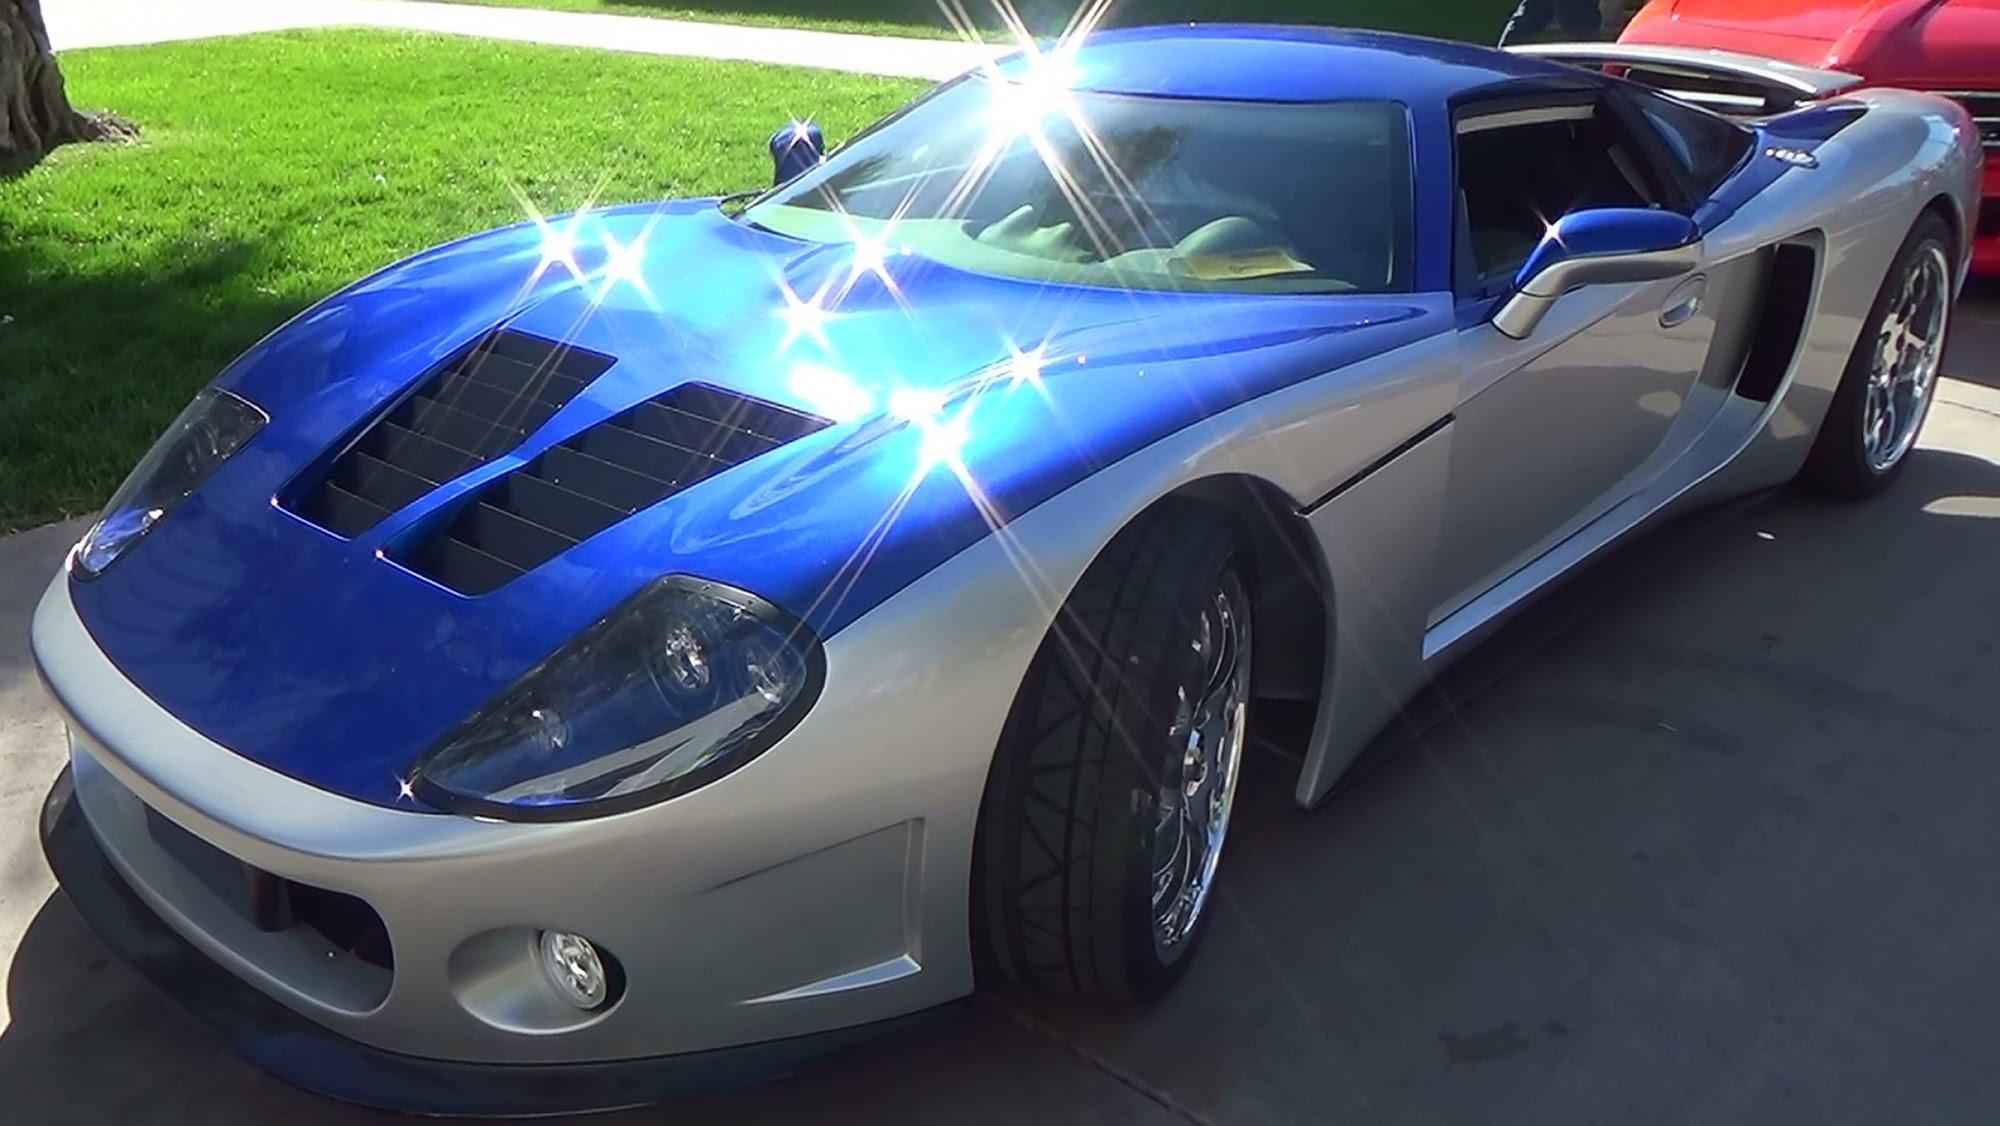 Factory Five GTM Supercar SEMA 2014 - ScottieDTV - Coolest